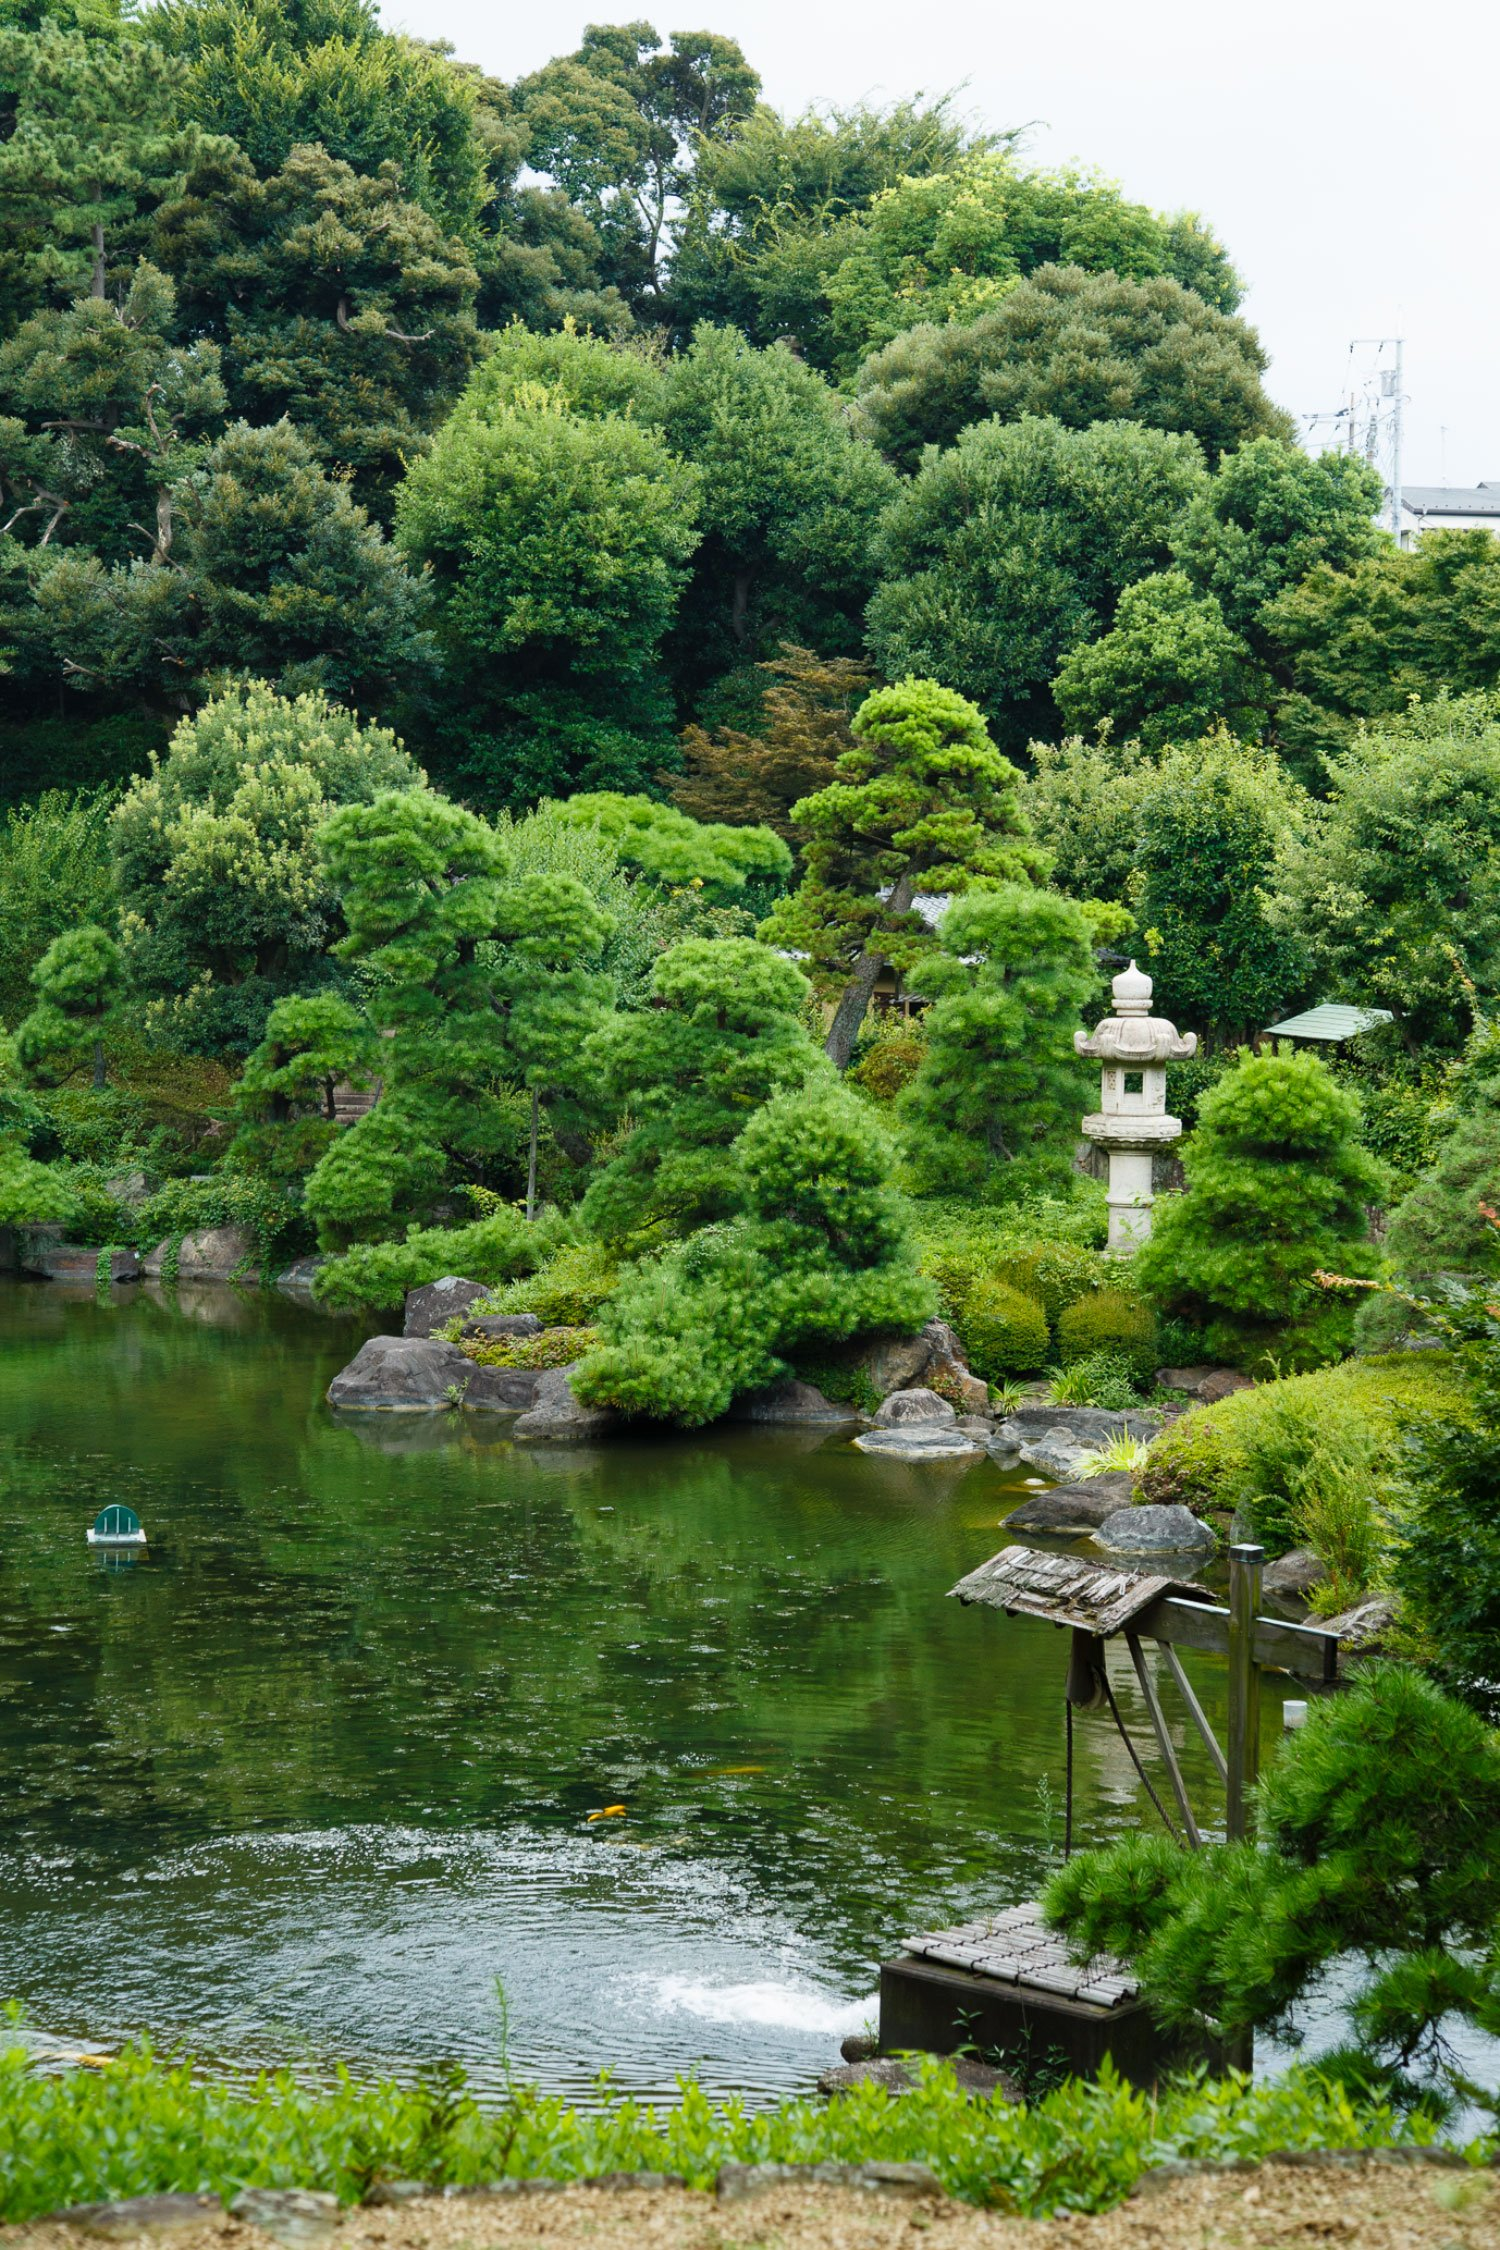 通常非公開の奥庭・松濤園。